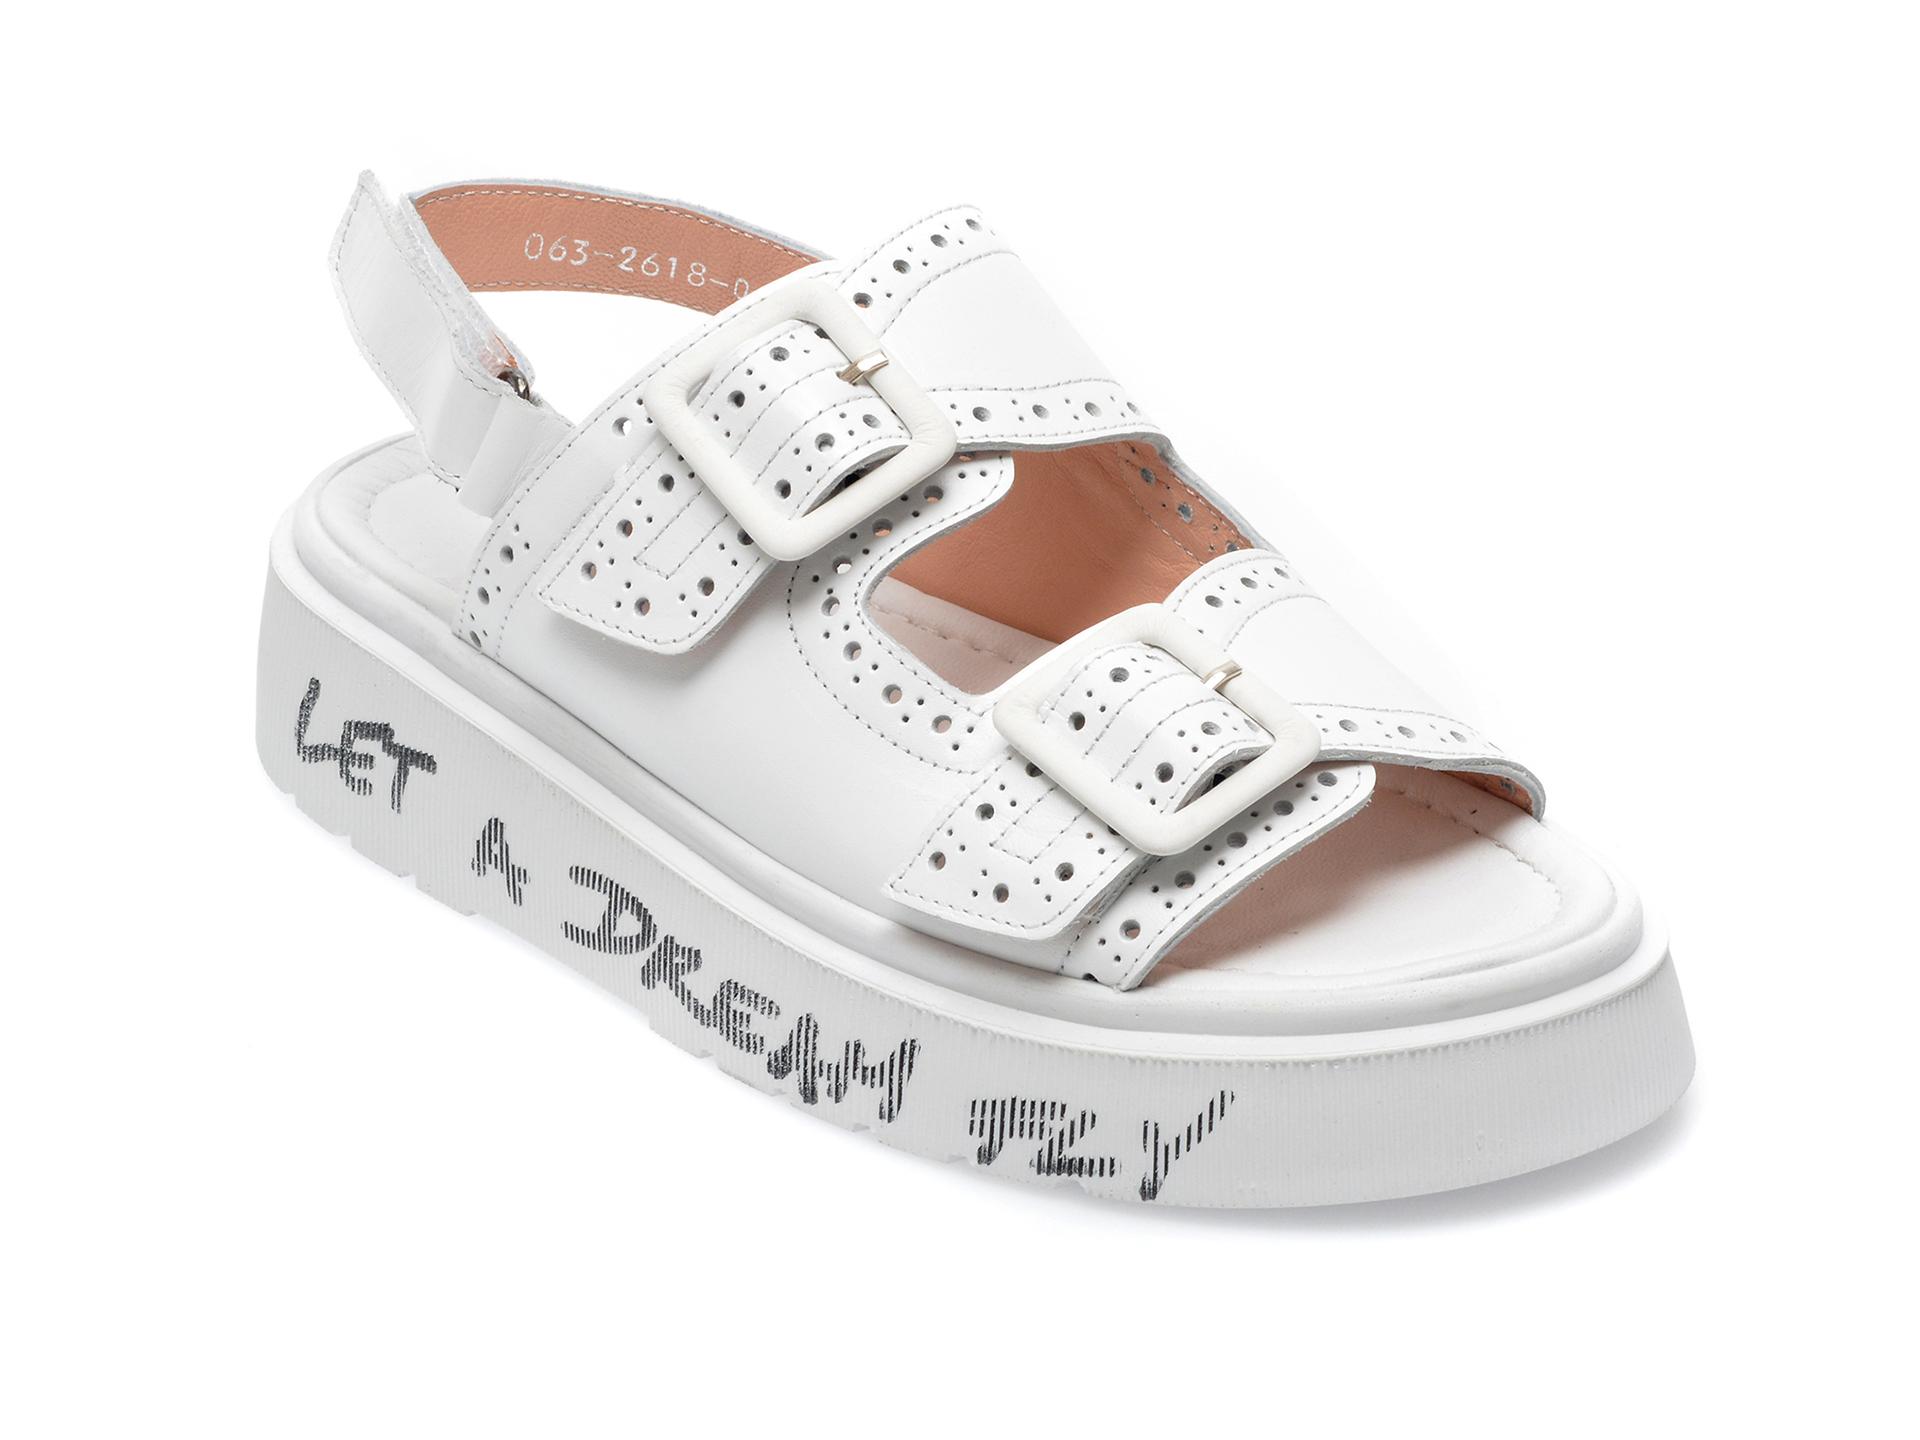 Sandale GRYXX albe, 06326YB, din piele naturala